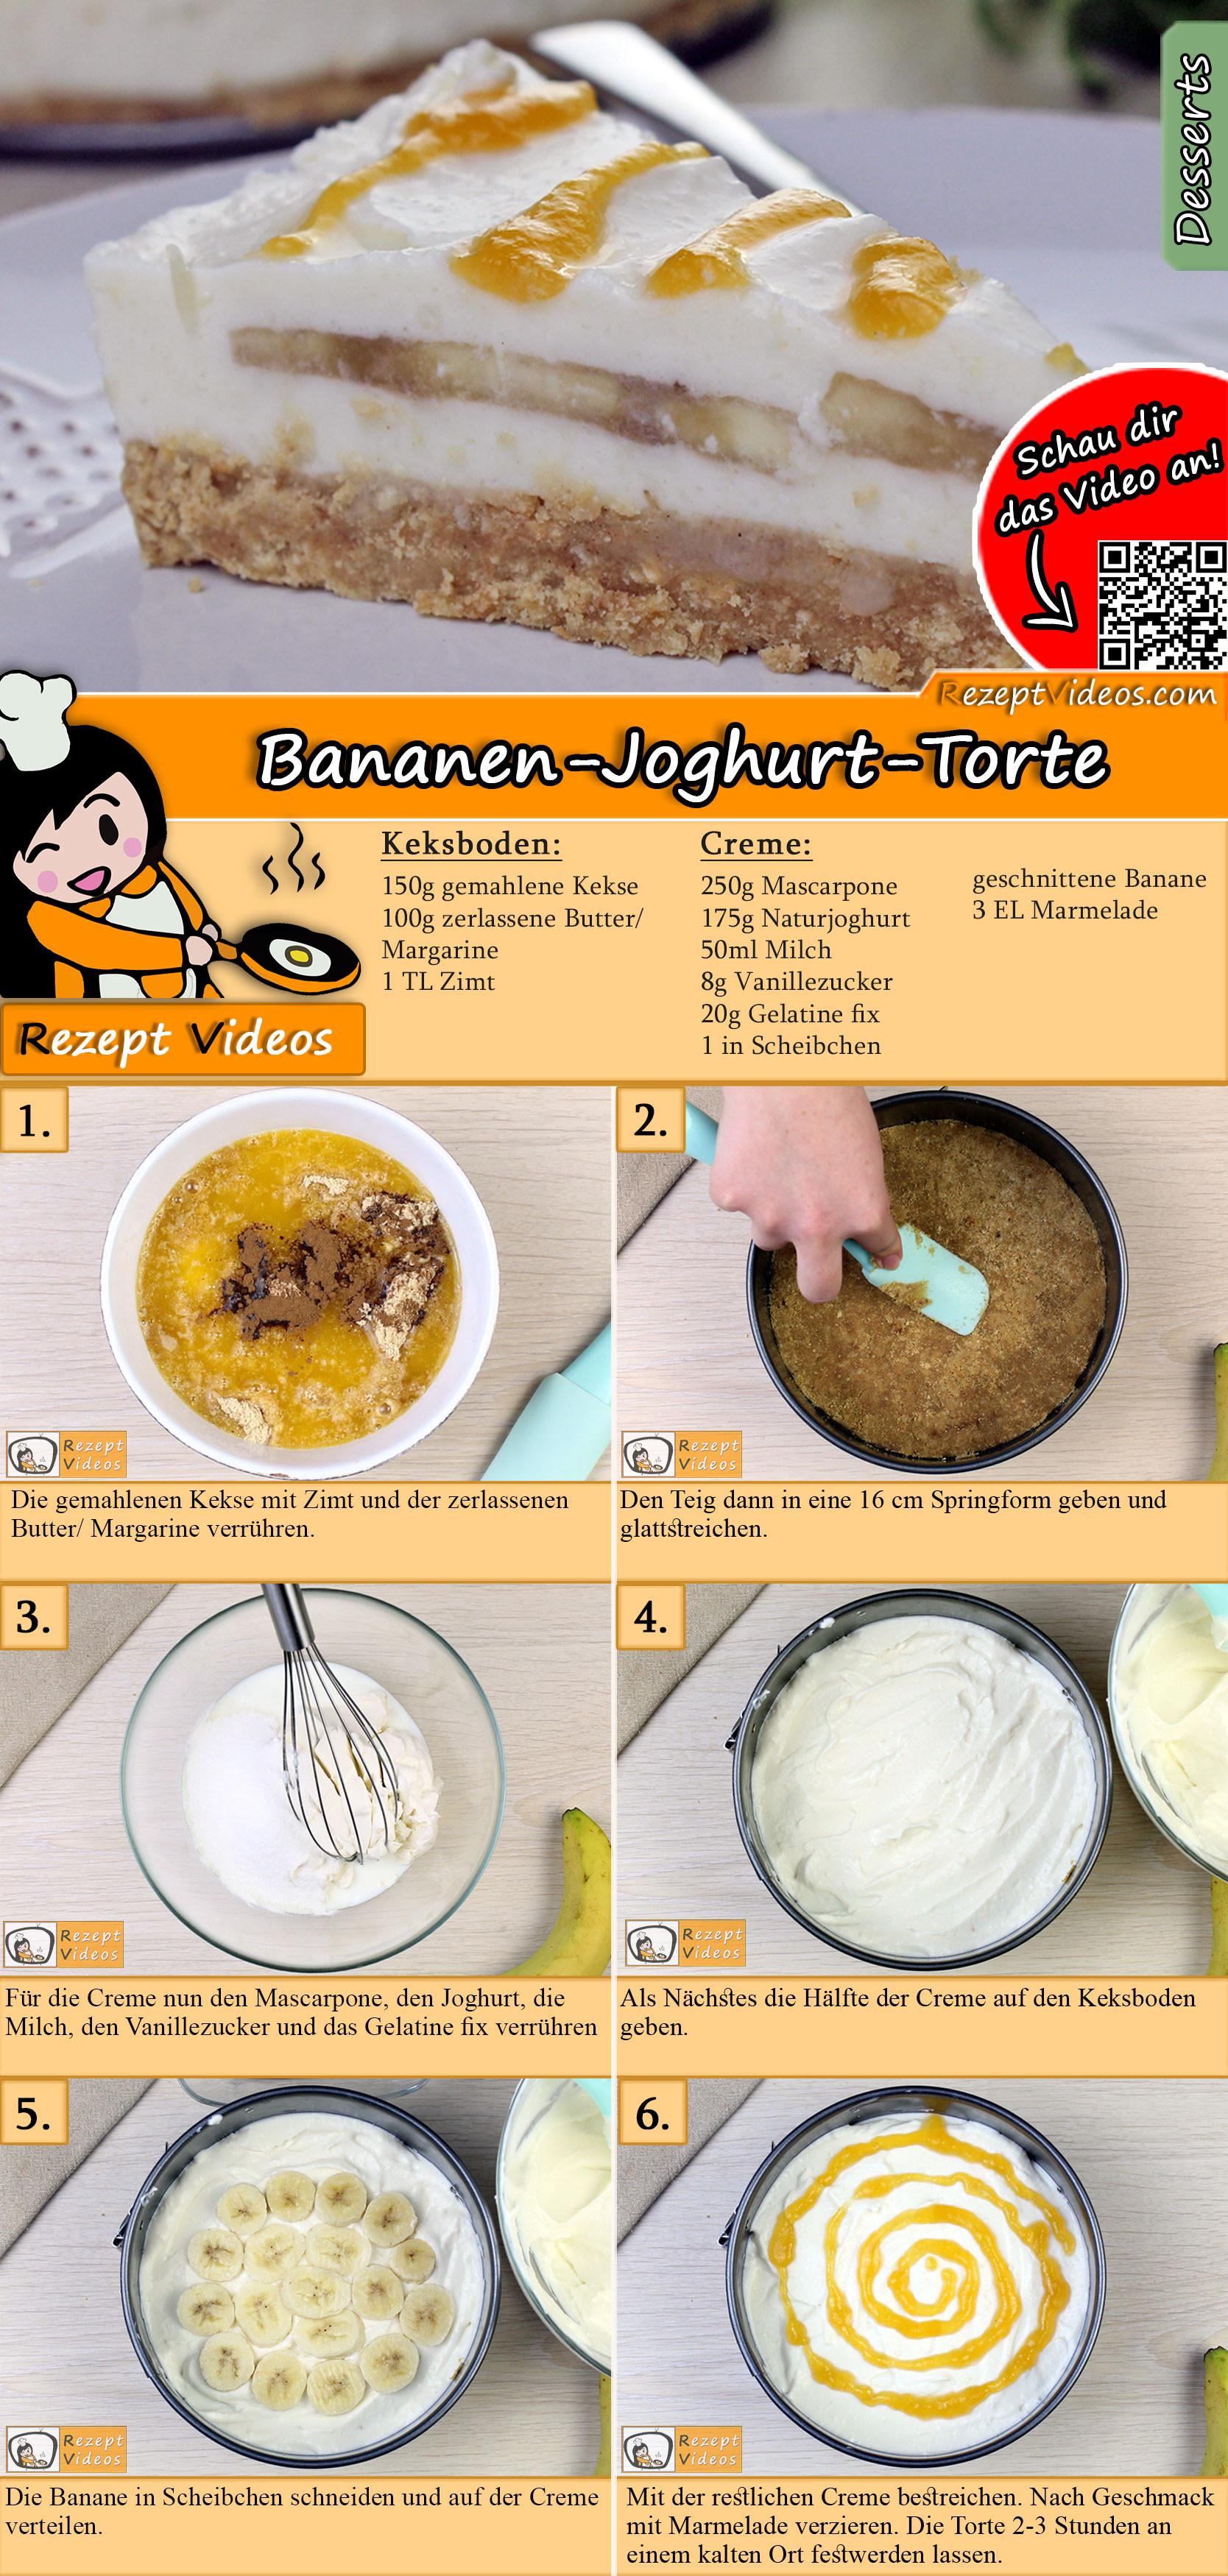 Bananen-Joghurt-Torte Rezept mit Video